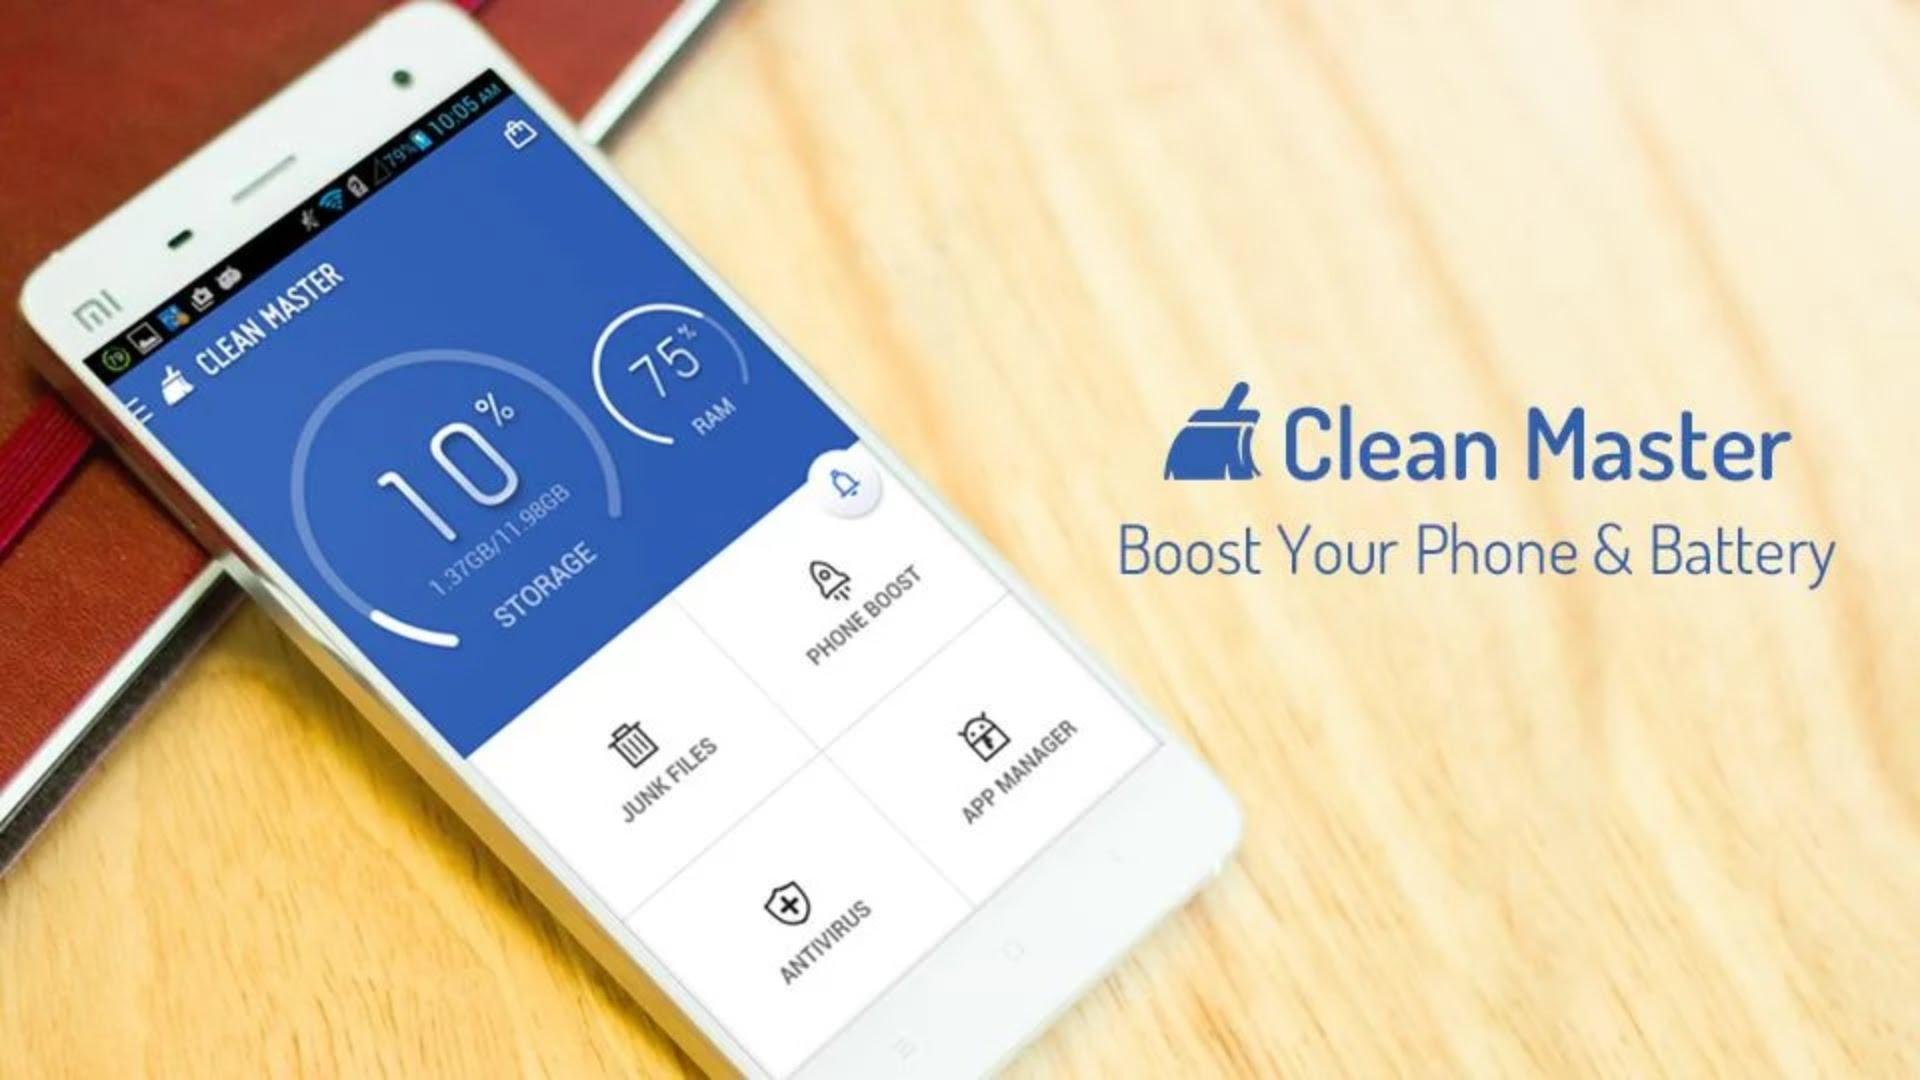 Clean Master (Boost & AppLock) برنامه ی پاکسازی اندروید